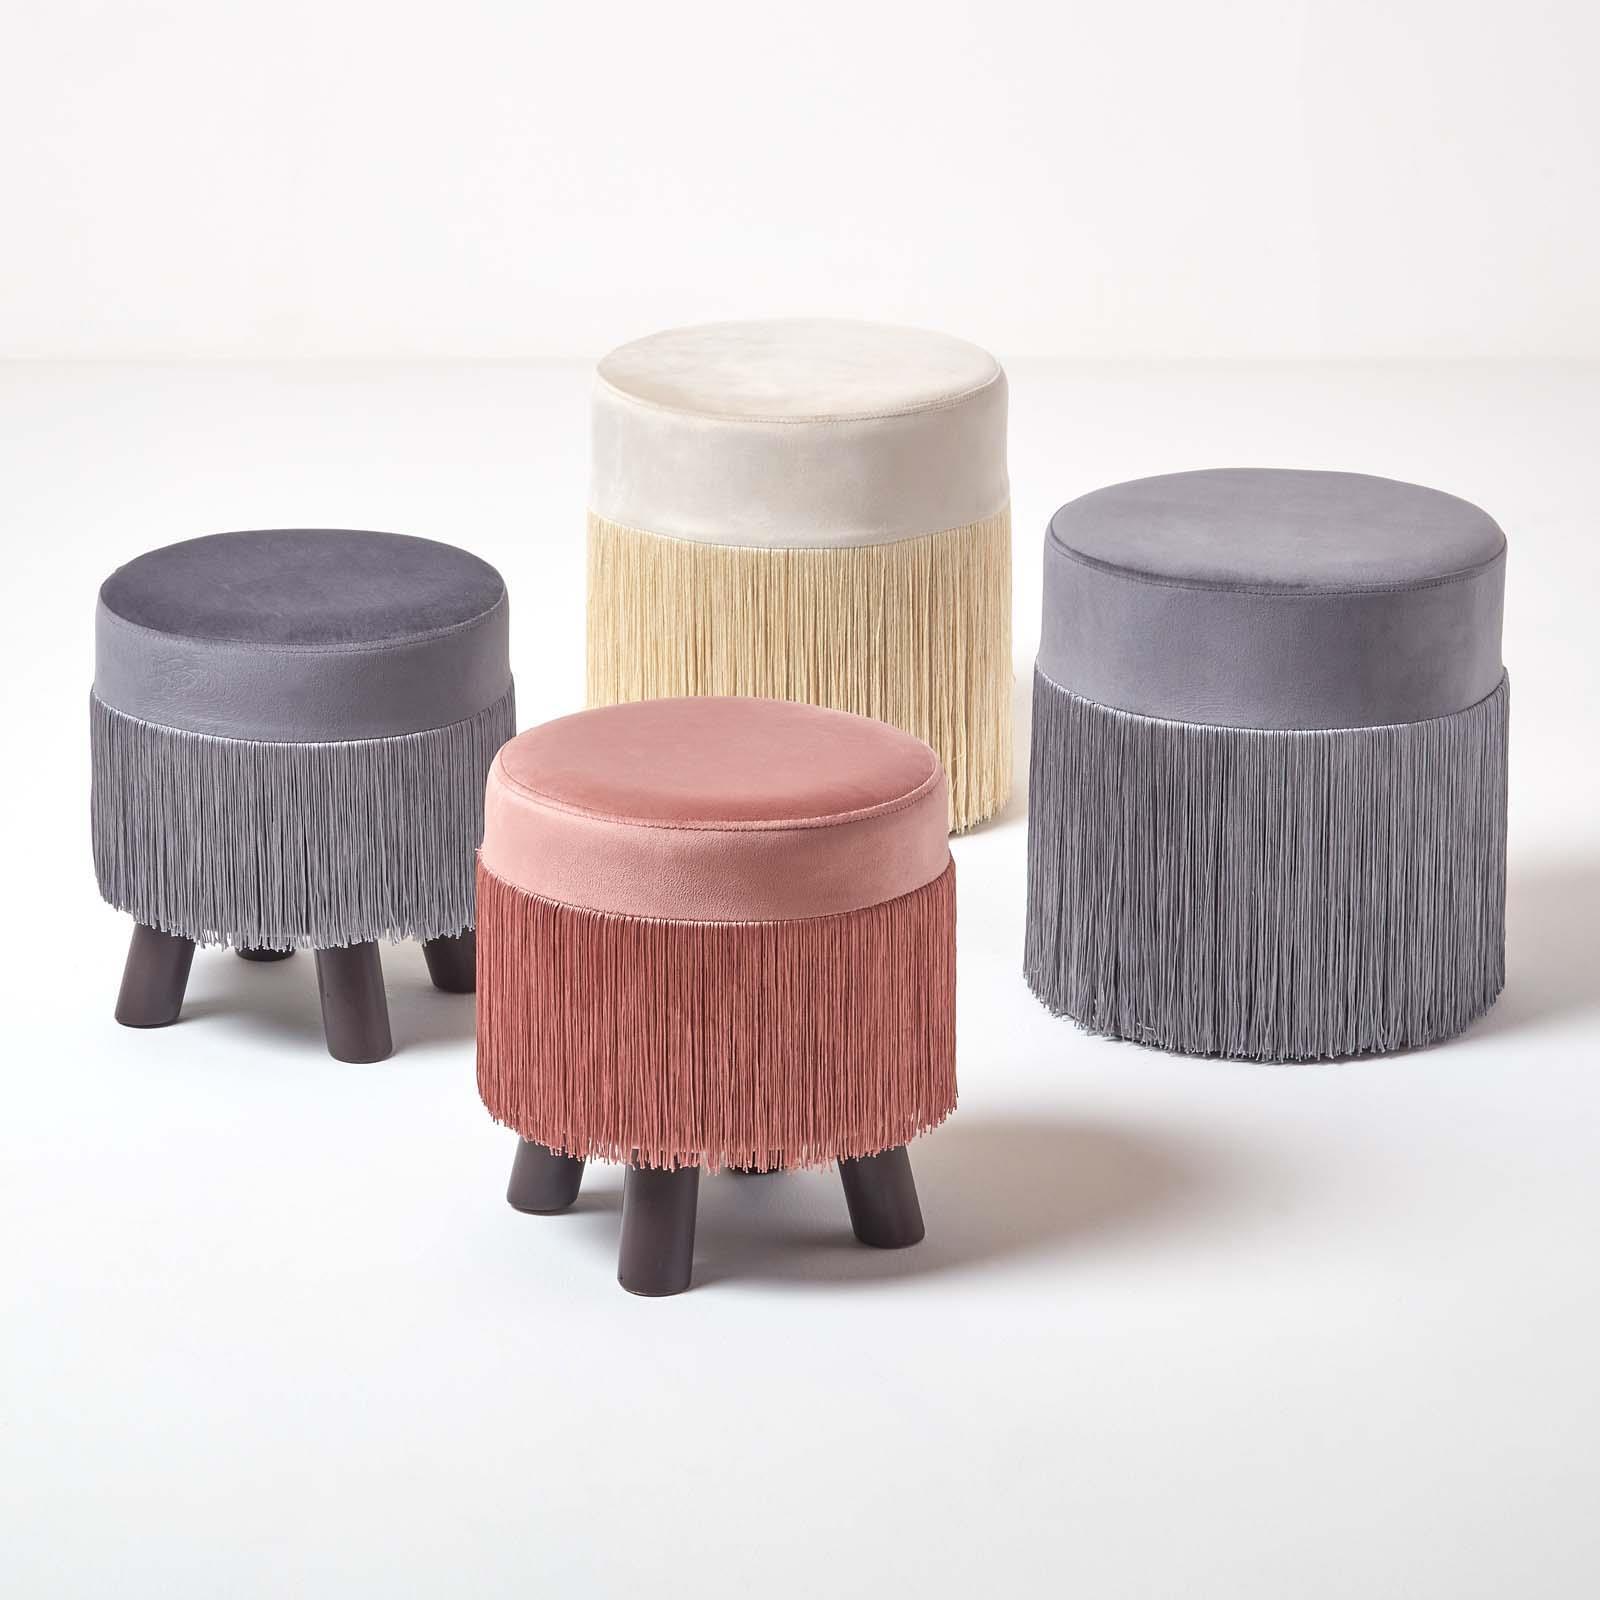 Velvet Pouffe with Retro Style Fringe Tassels Upholstered Round Footstool